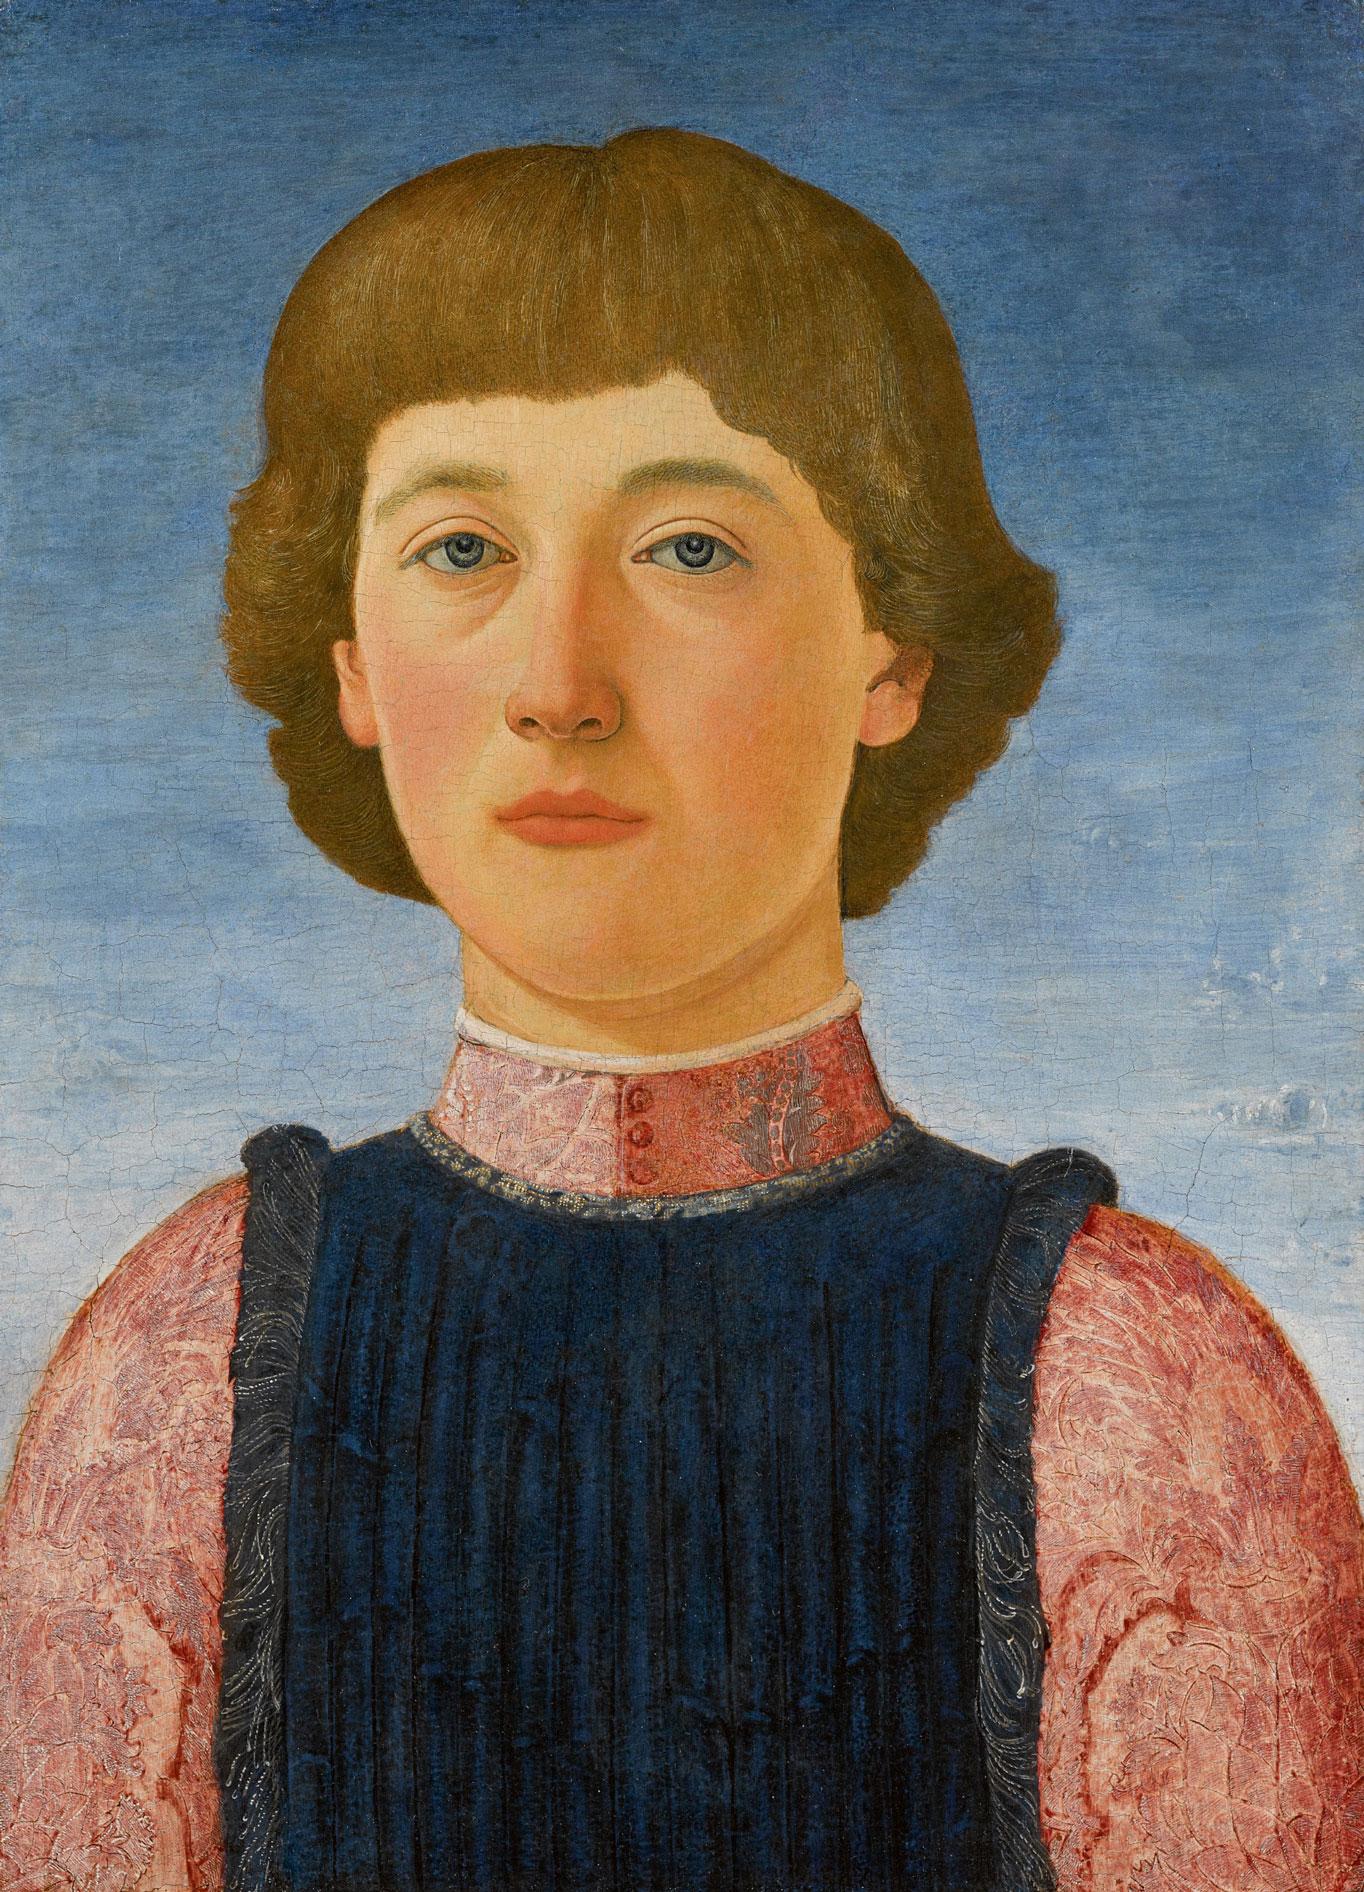 Lot-109,-Piero-del-Pollaiuolo_Portrait-of-a-Youth_Estimate-£4-6-million-(Custom).jpg